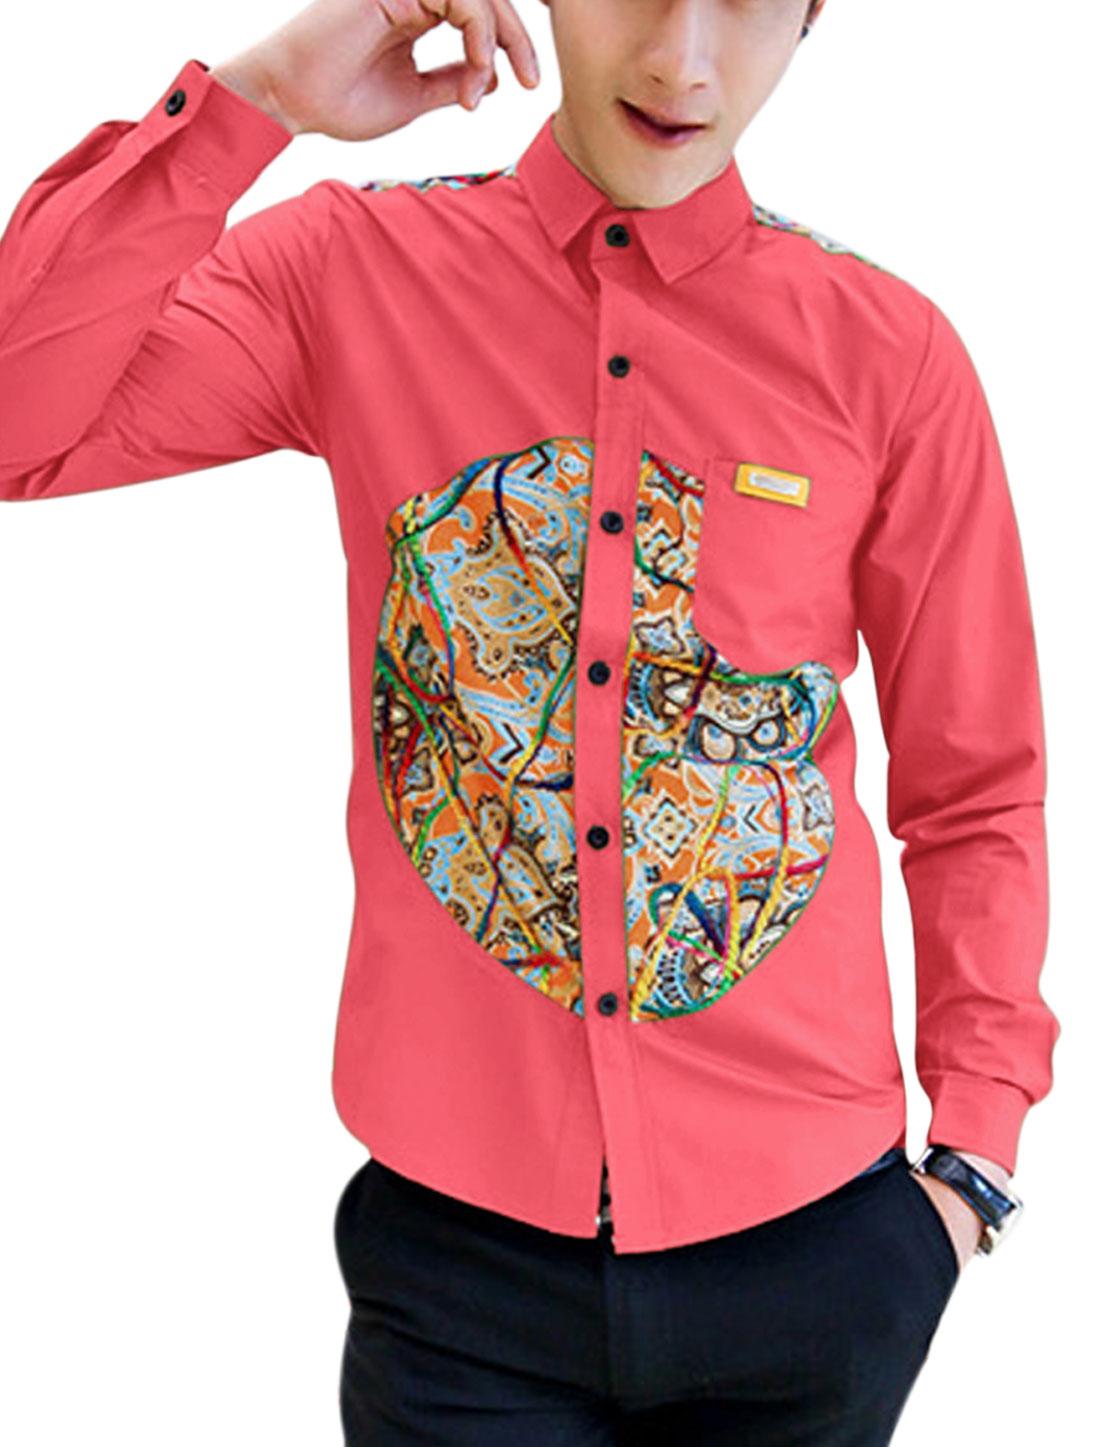 Men Casual Contrast Novelty Print Panel Design Shirt Watermelon Red M